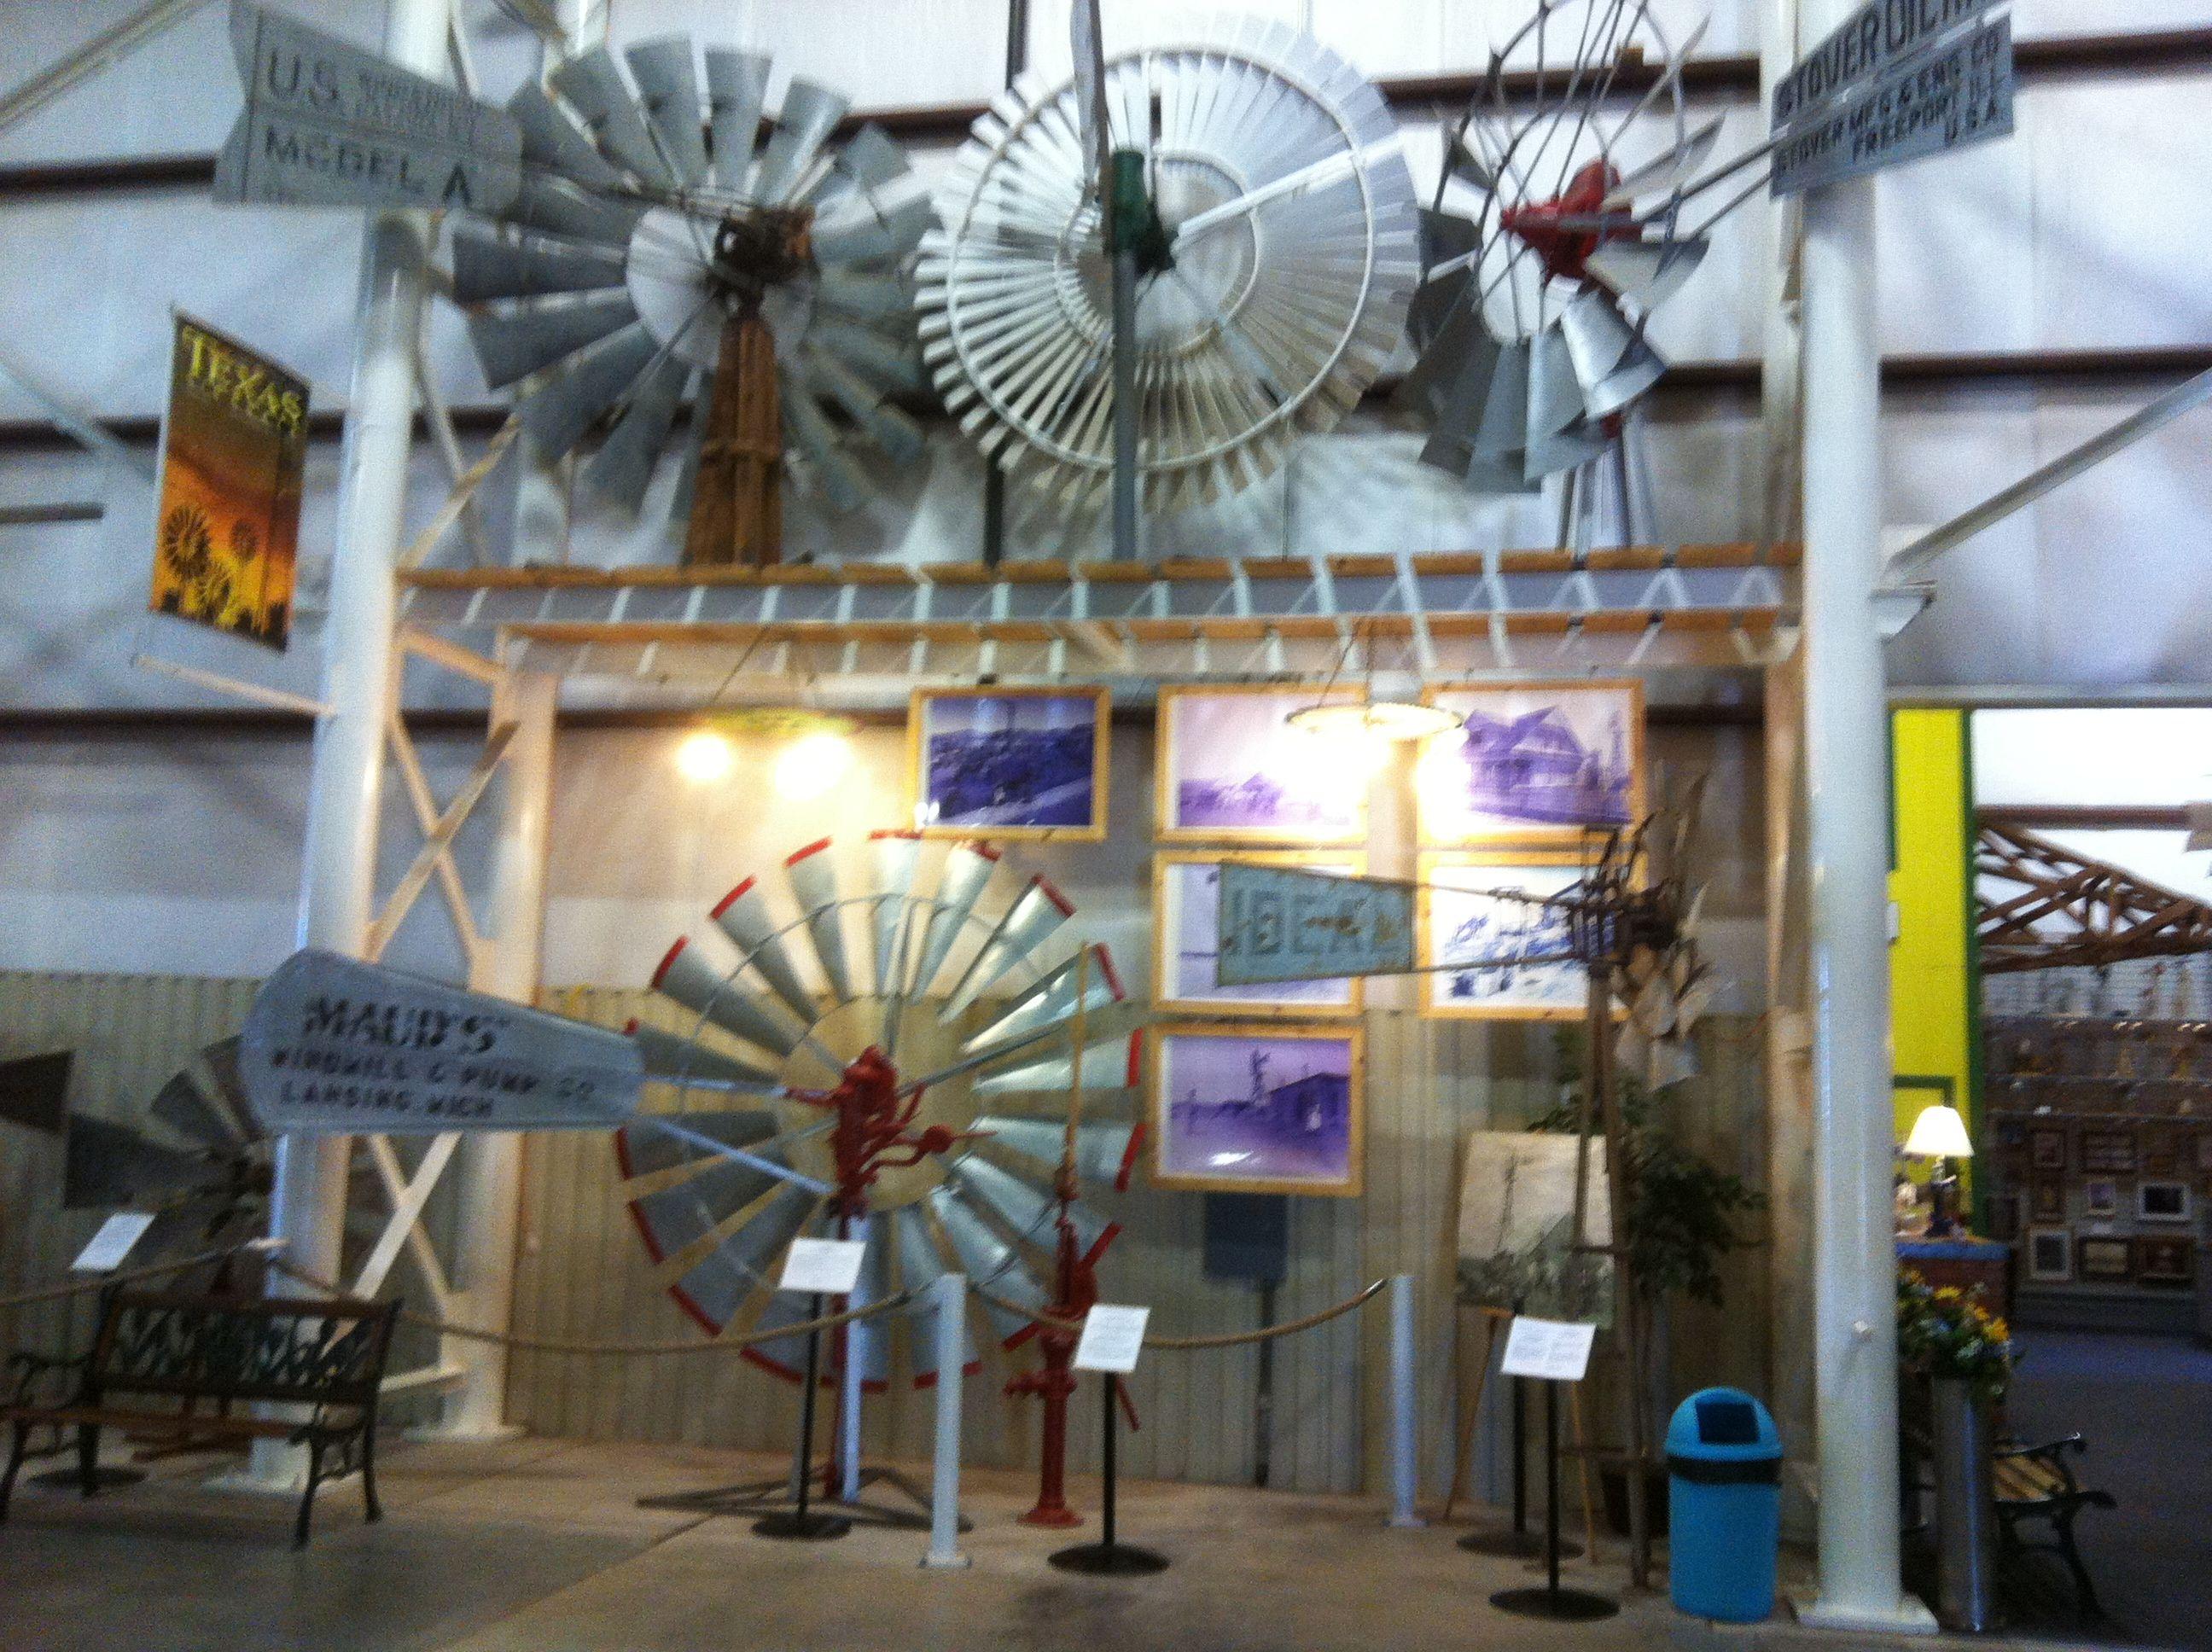 Wind turbine museum lubbock texas lubbock texas lubbock